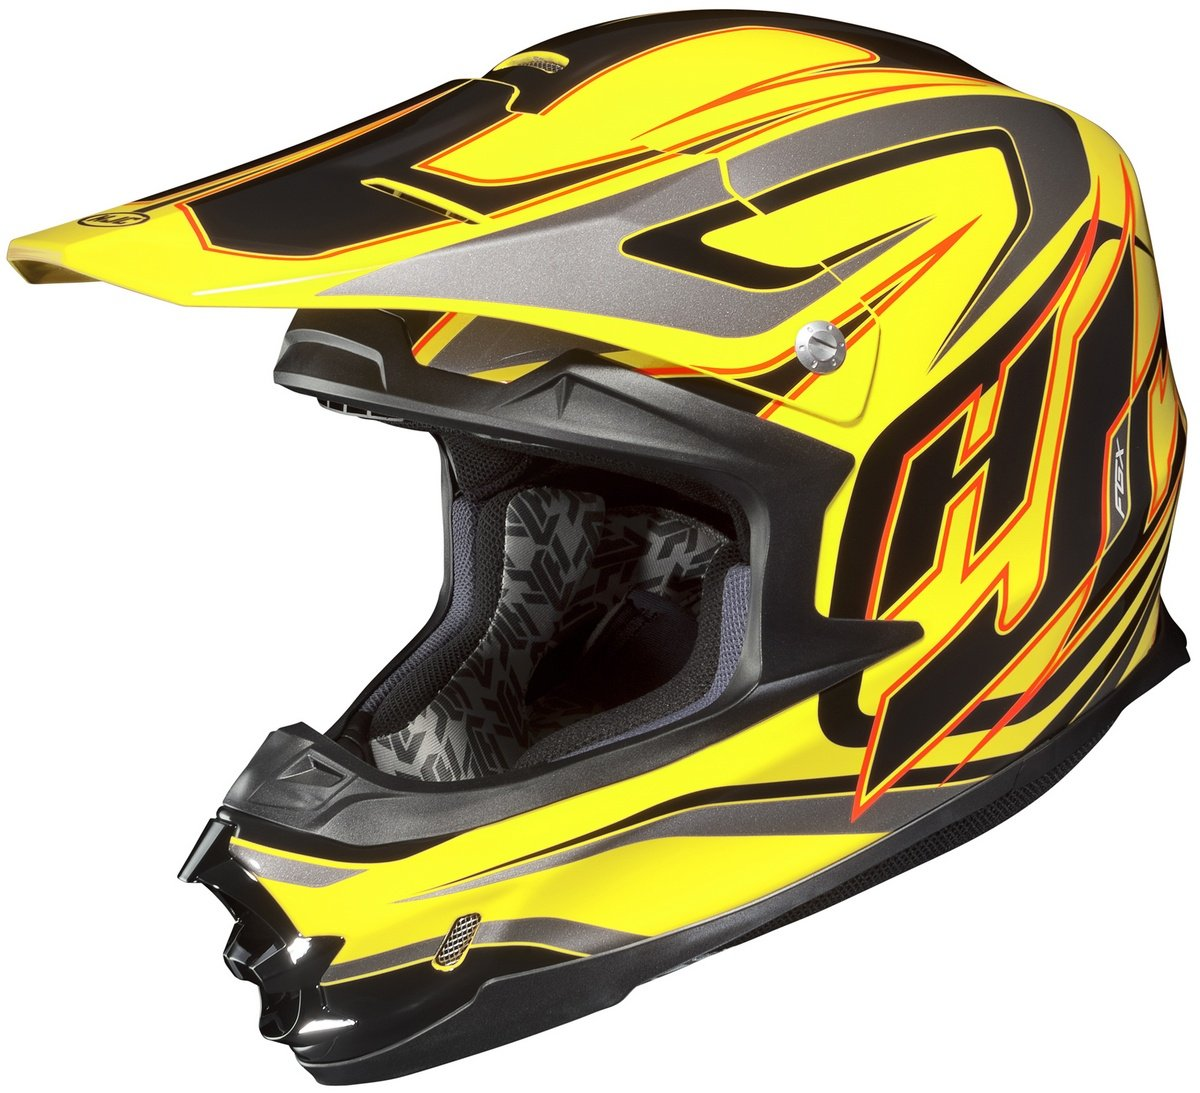 Amazon.com: HJC Hammer Mens FG-X MX/Off-Road/Dirt Bike Motorcycle Helmet - MC-3 / Large: Automotive